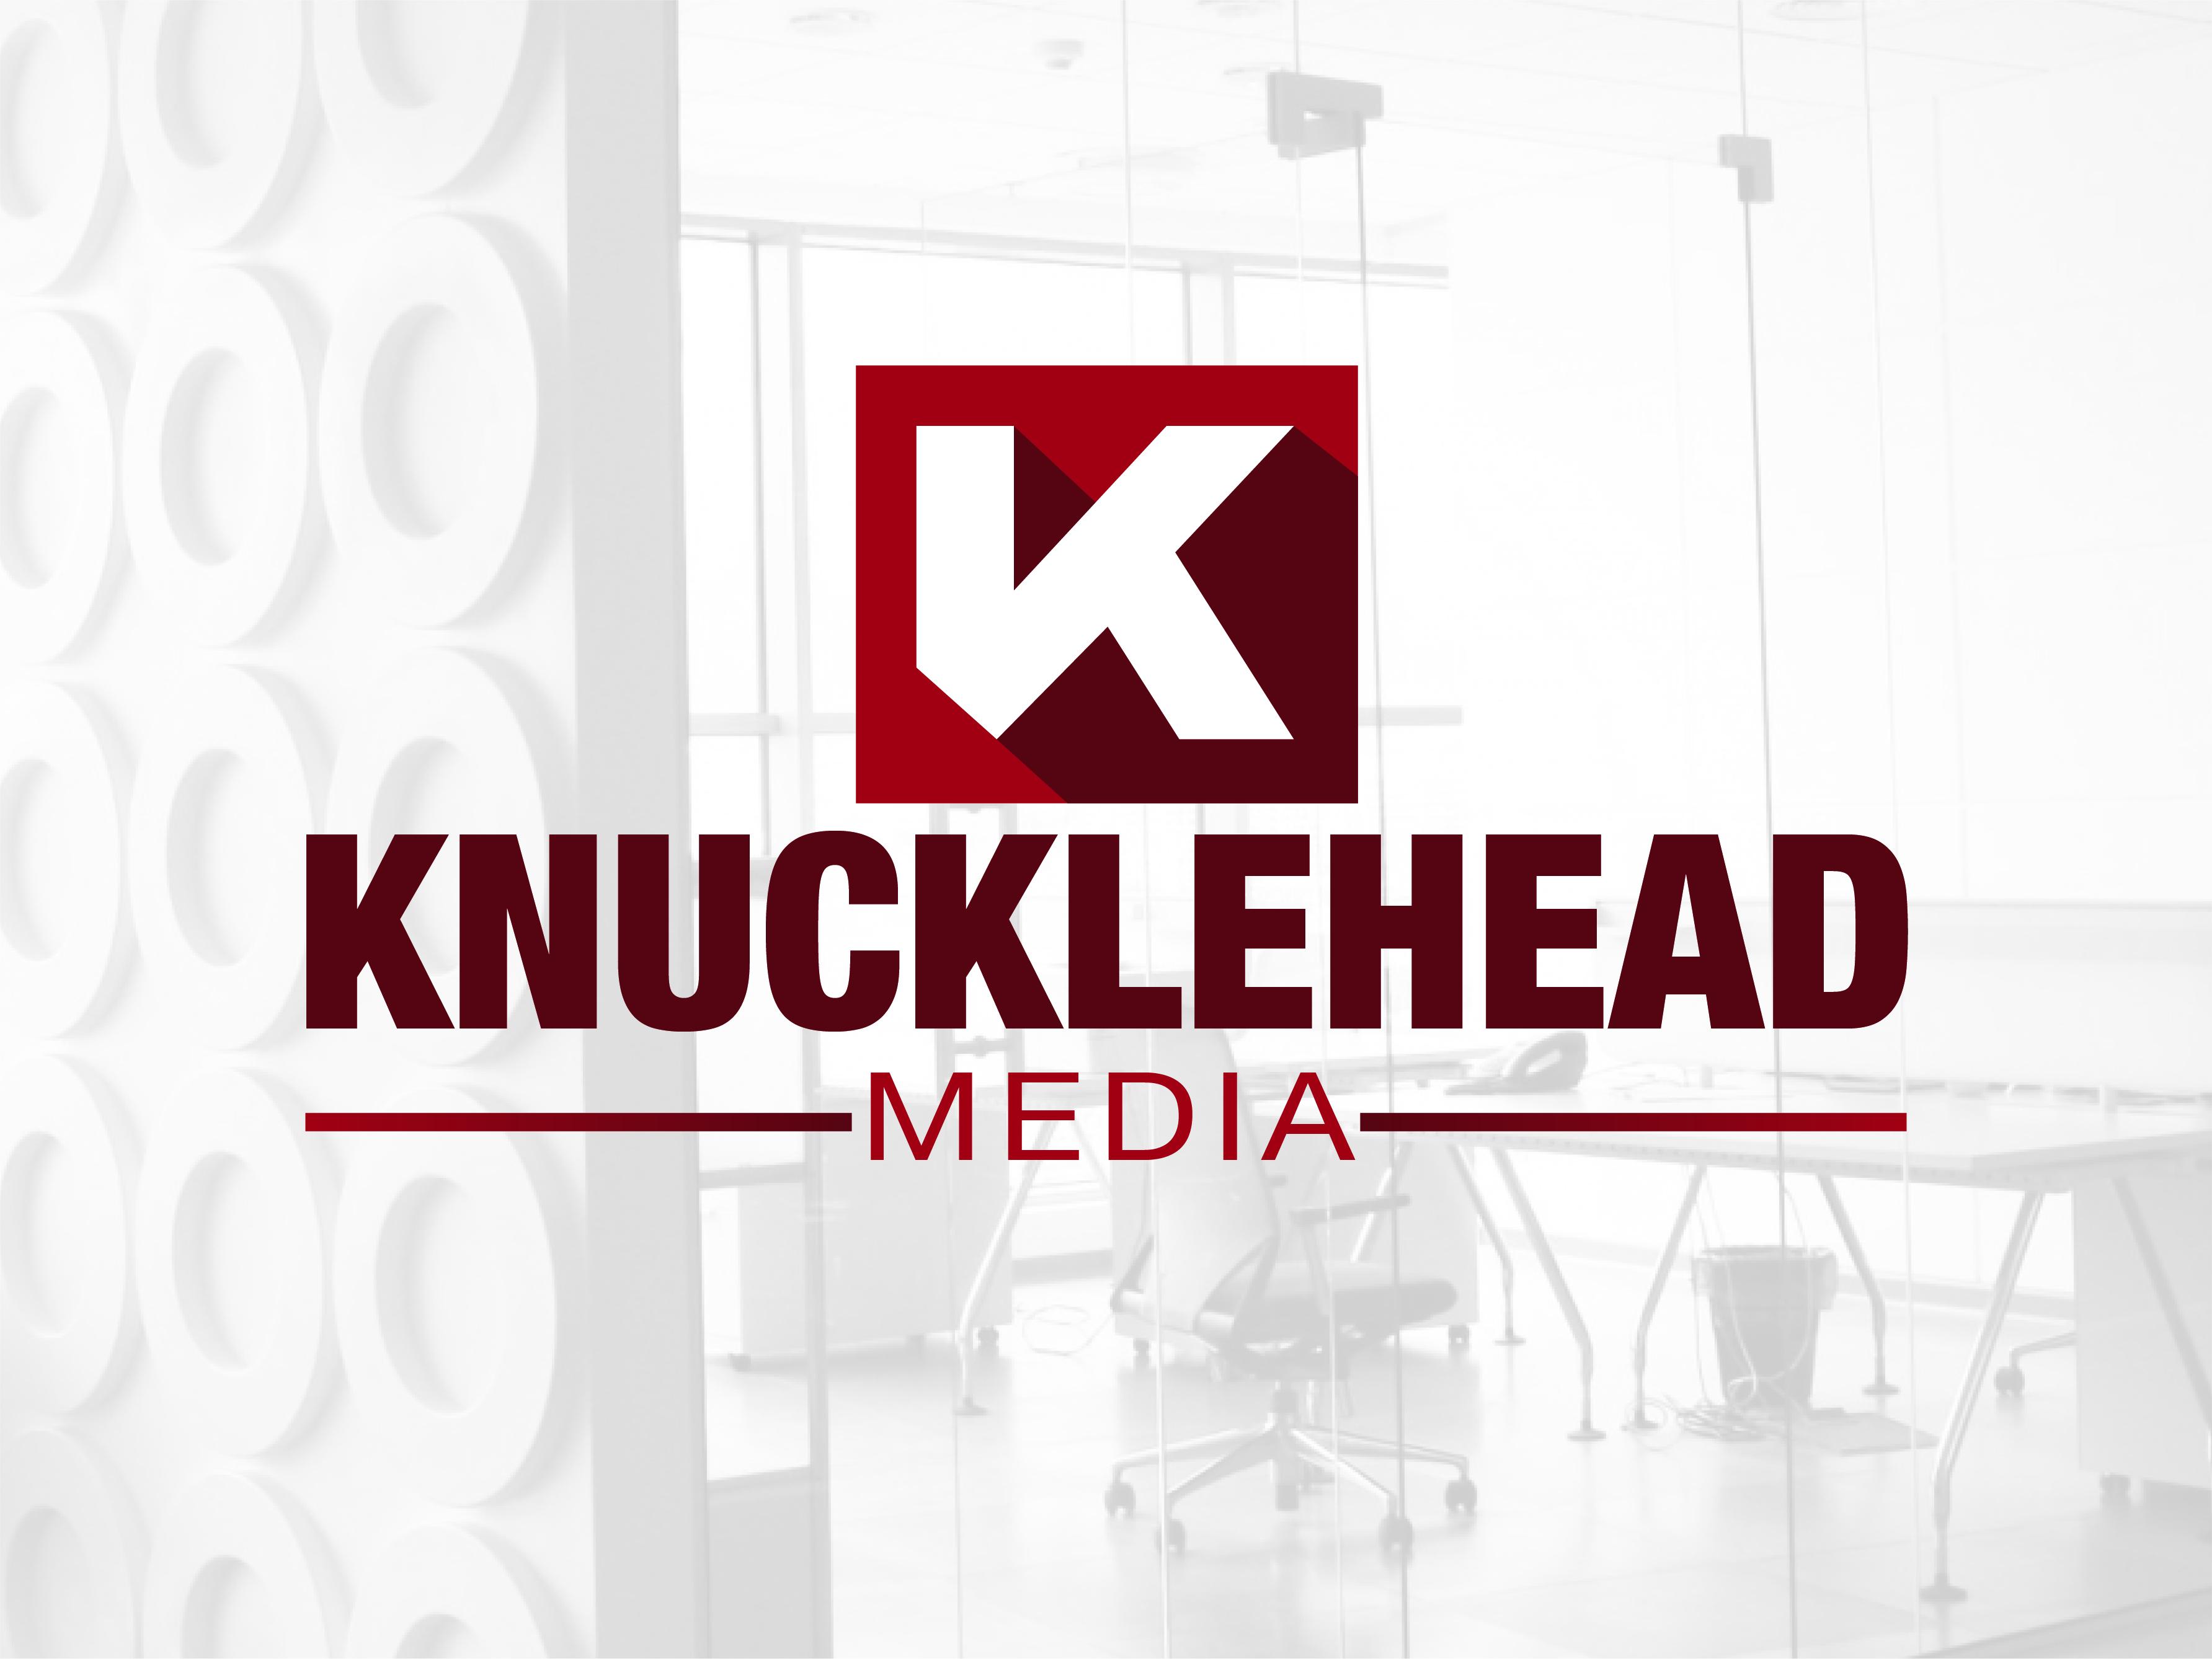 Logo Design by Rob King - Entry No. 75 in the Logo Design Contest Imaginative Logo Design for knucklehead media.